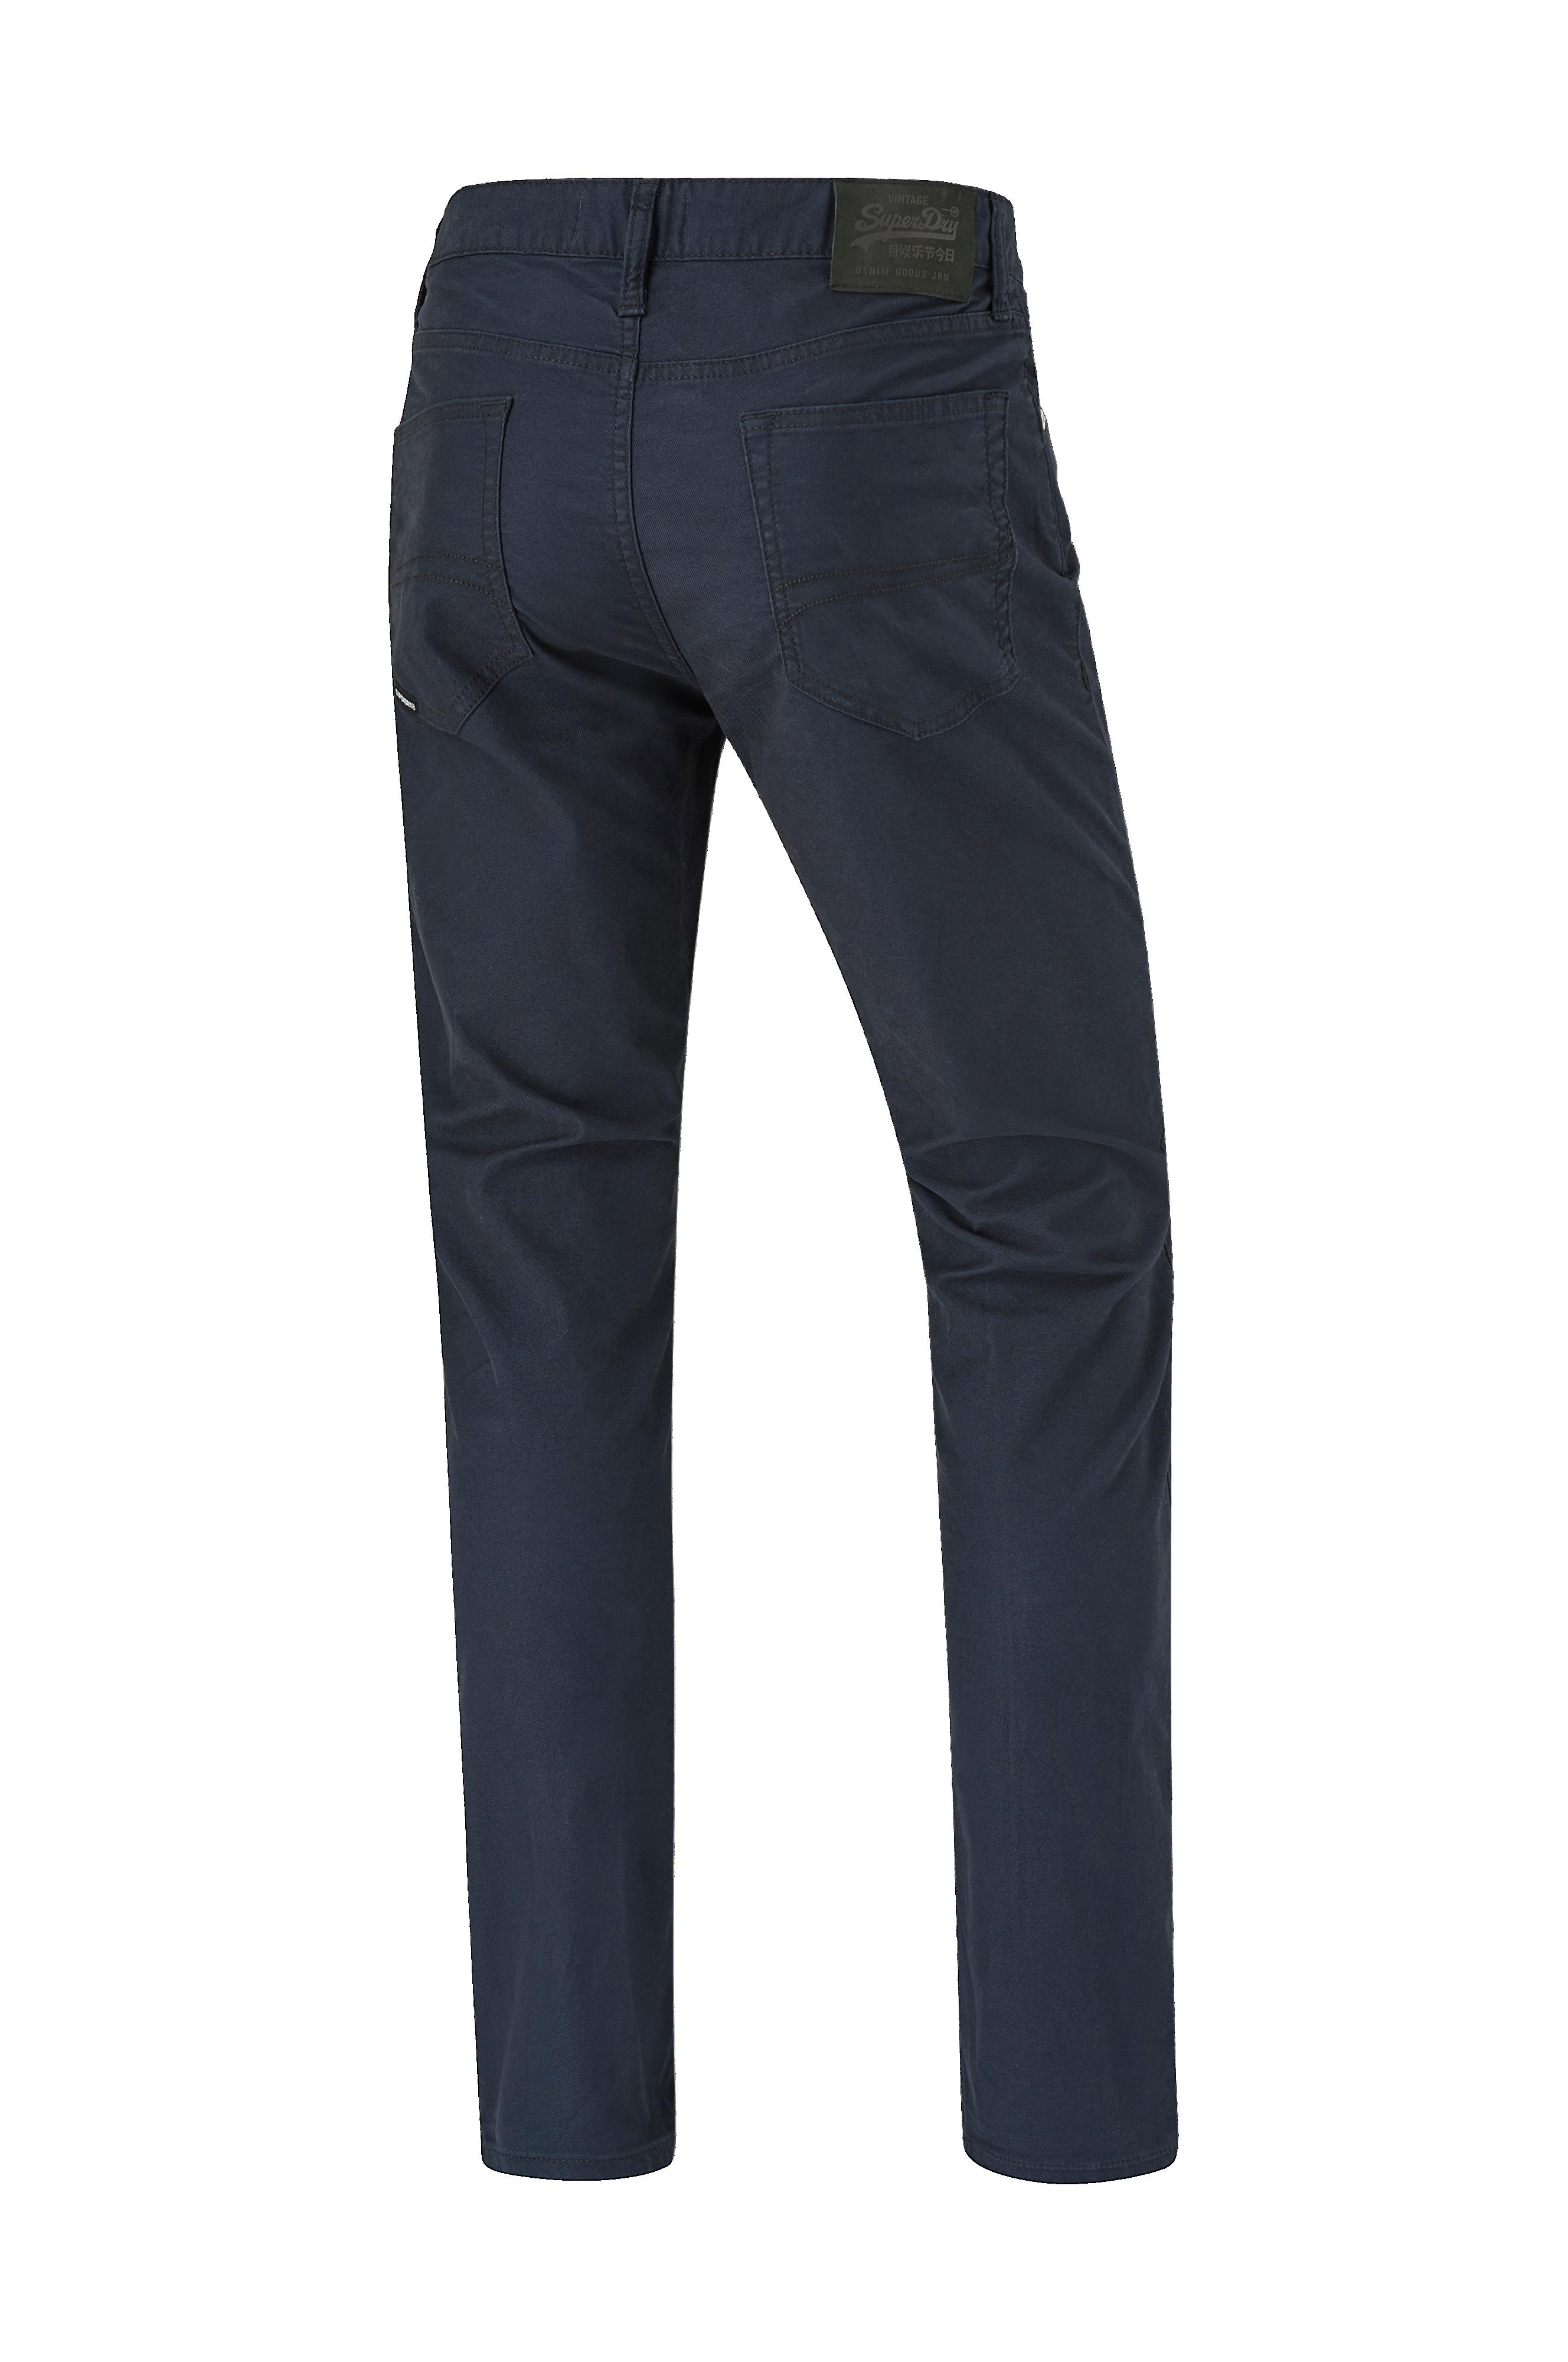 Superdry Jeans Edit Tyler Slim Dbl Dye Twills - Blå - Herr